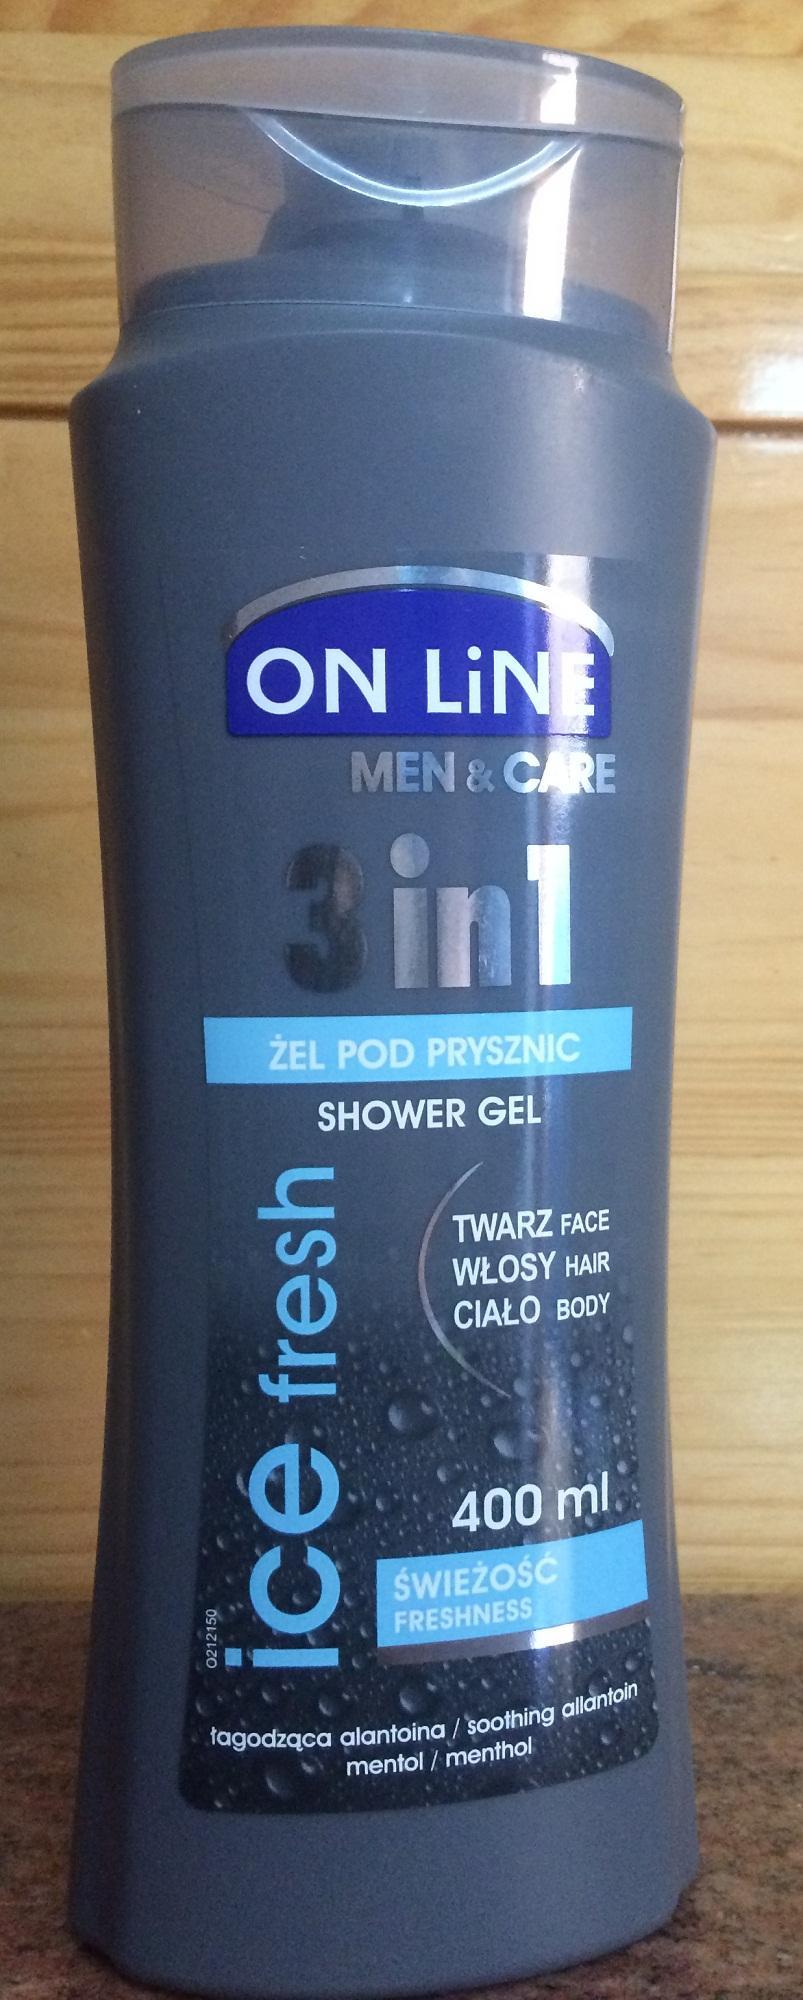 Hình ảnh Online Shower Gel for men 3 in 1 ( nhập khẩu từ Ba Lan)